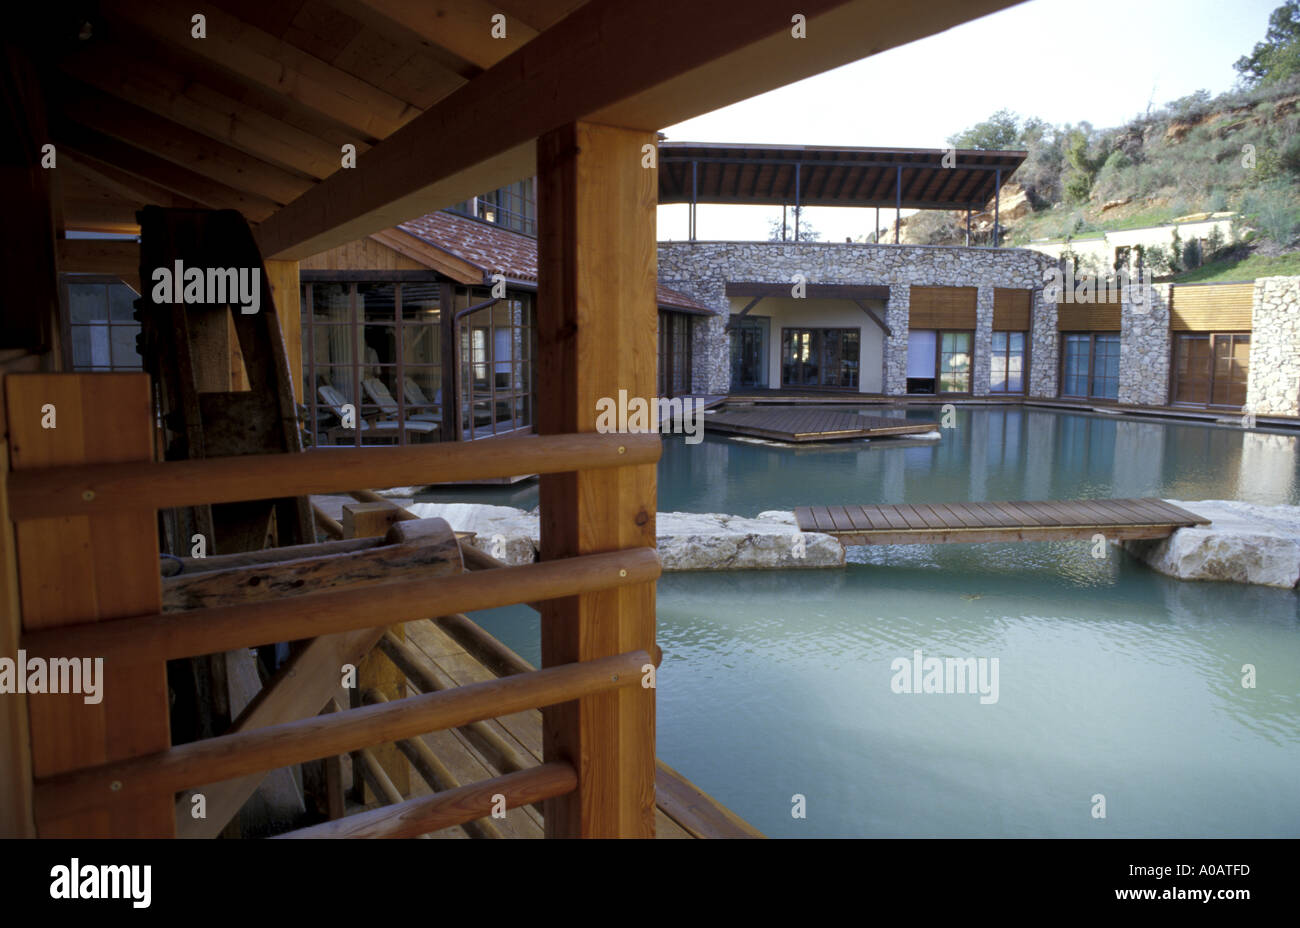 Sauna adler thermae bagno vignoni tuscany italy stock photo: 3244284